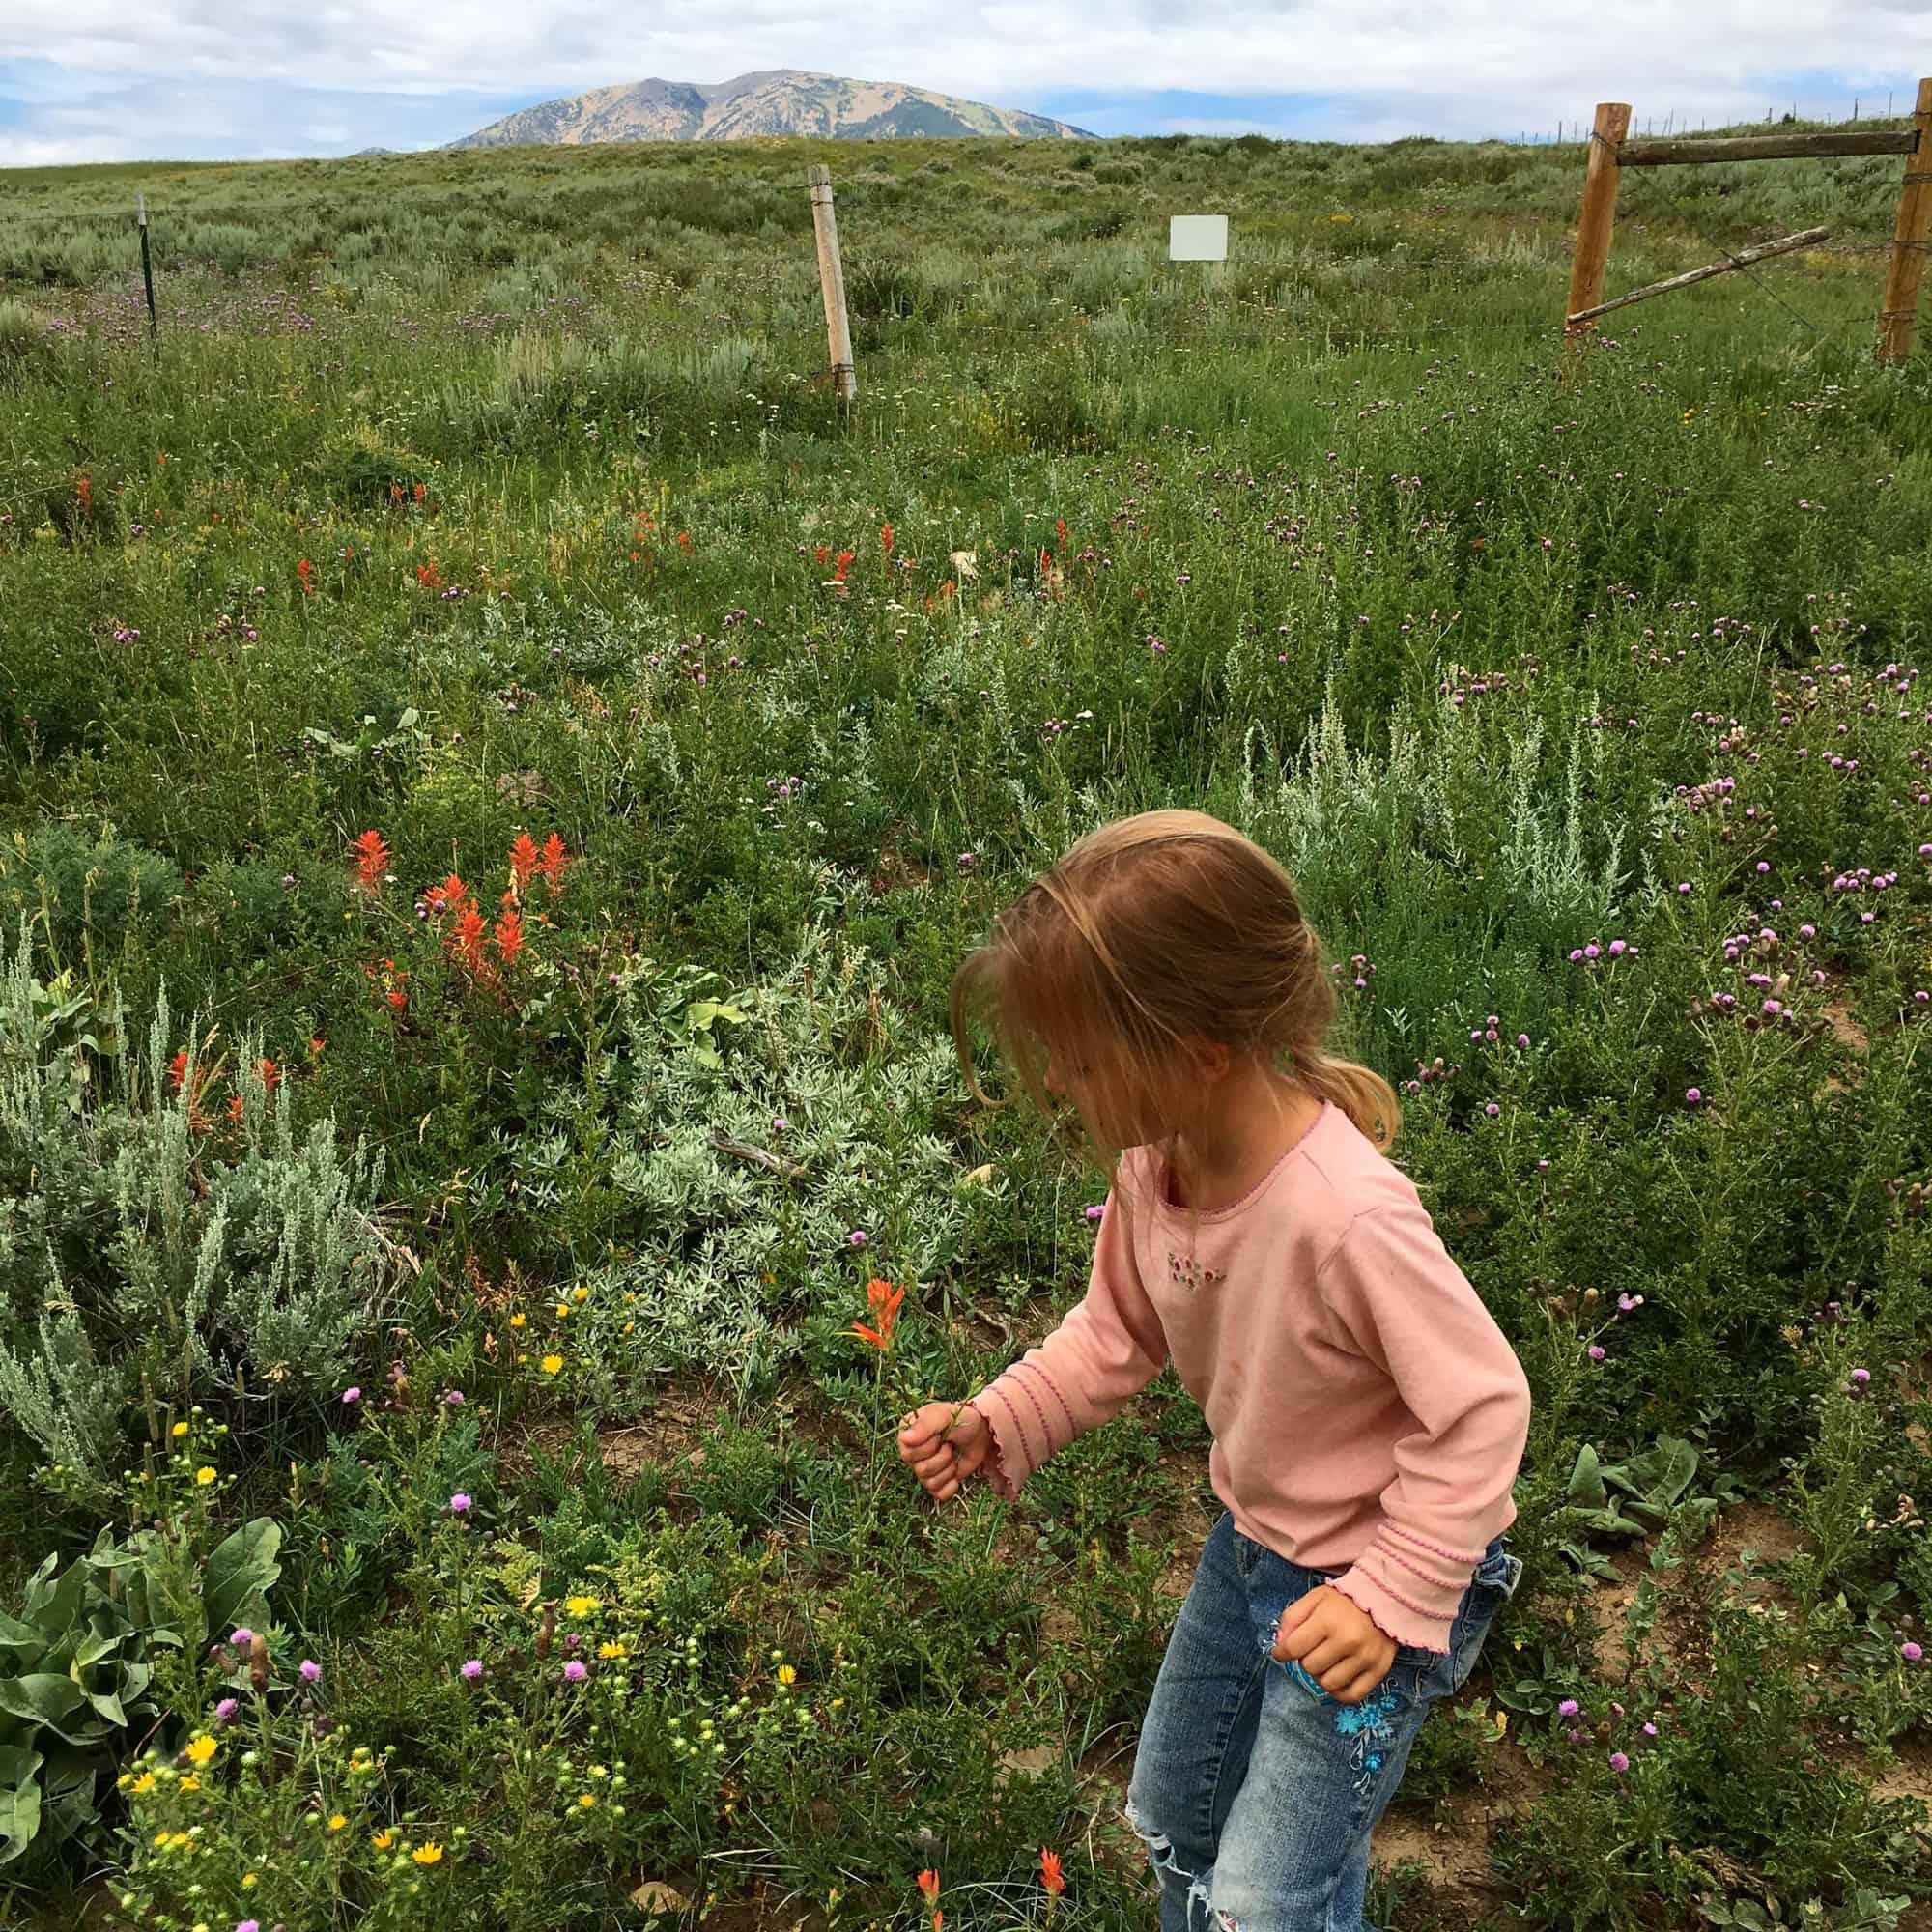 girl picking wildflowers in field